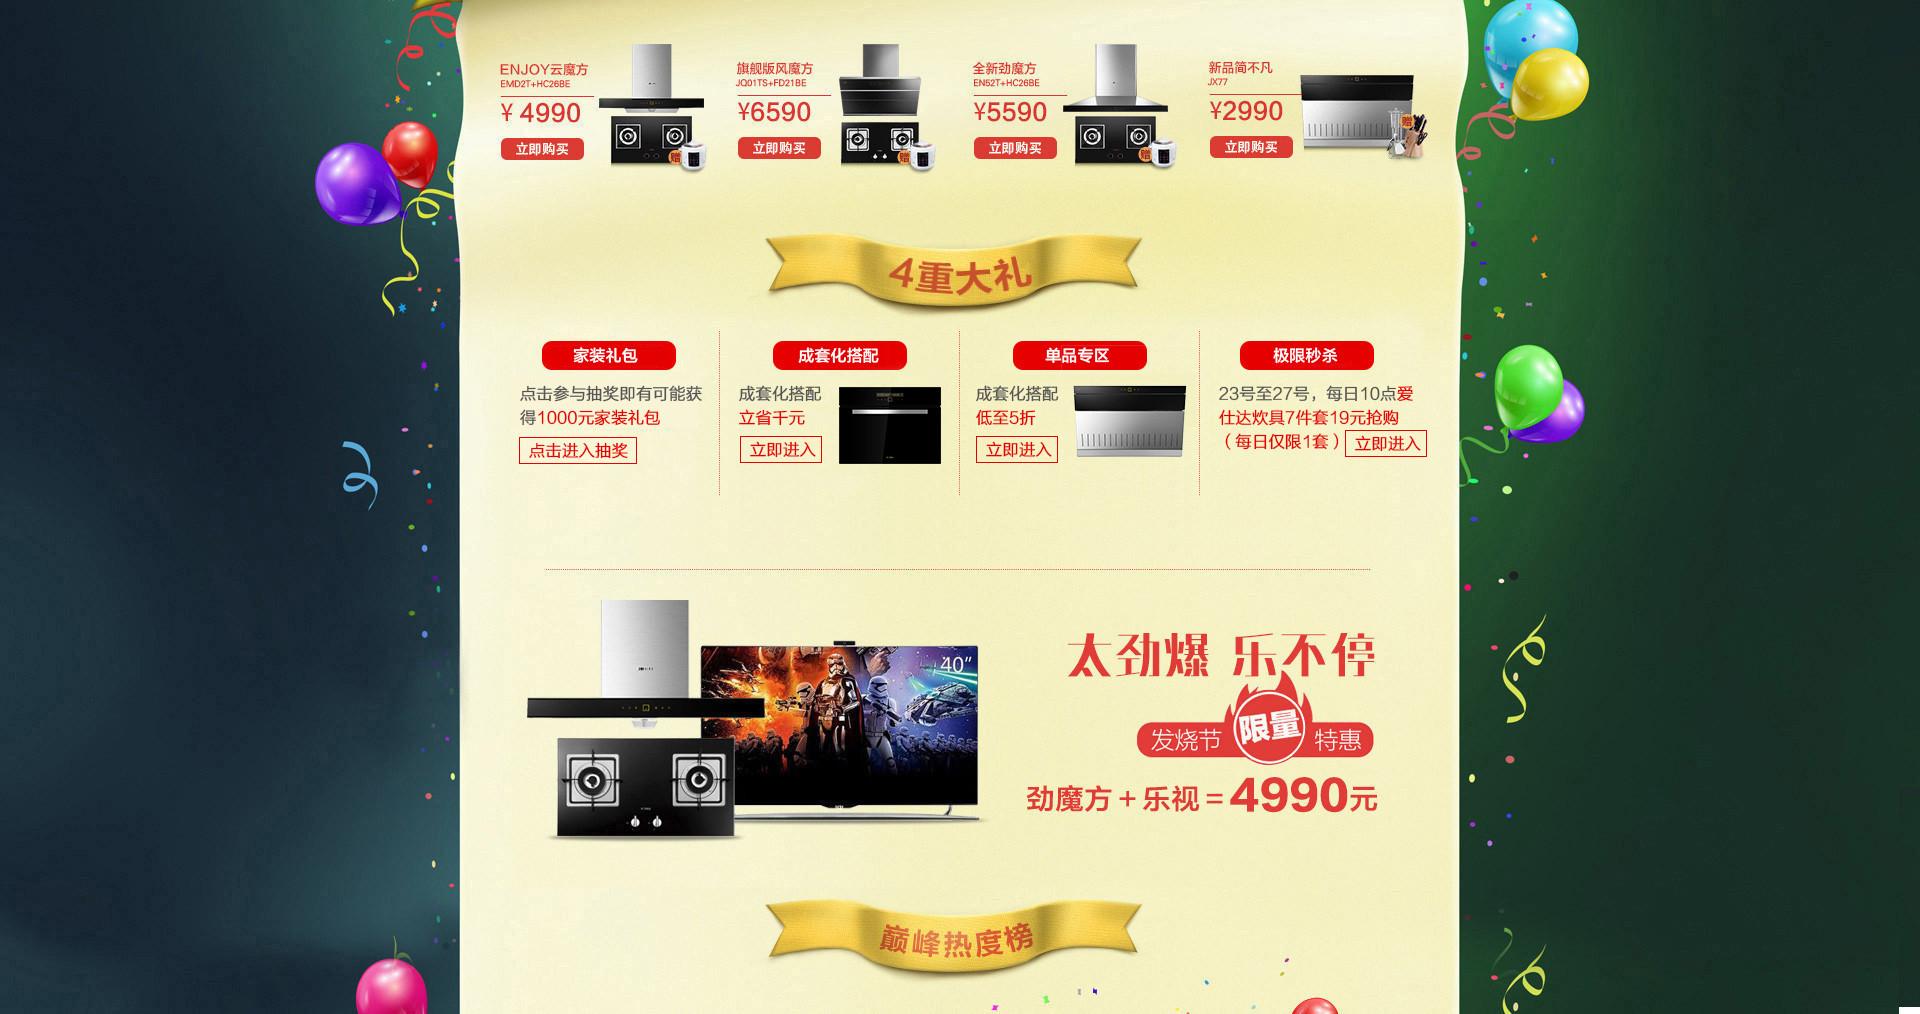 http://image.suning.cn/uimg/sop/commodity/600101960138012424539990_x.jpg